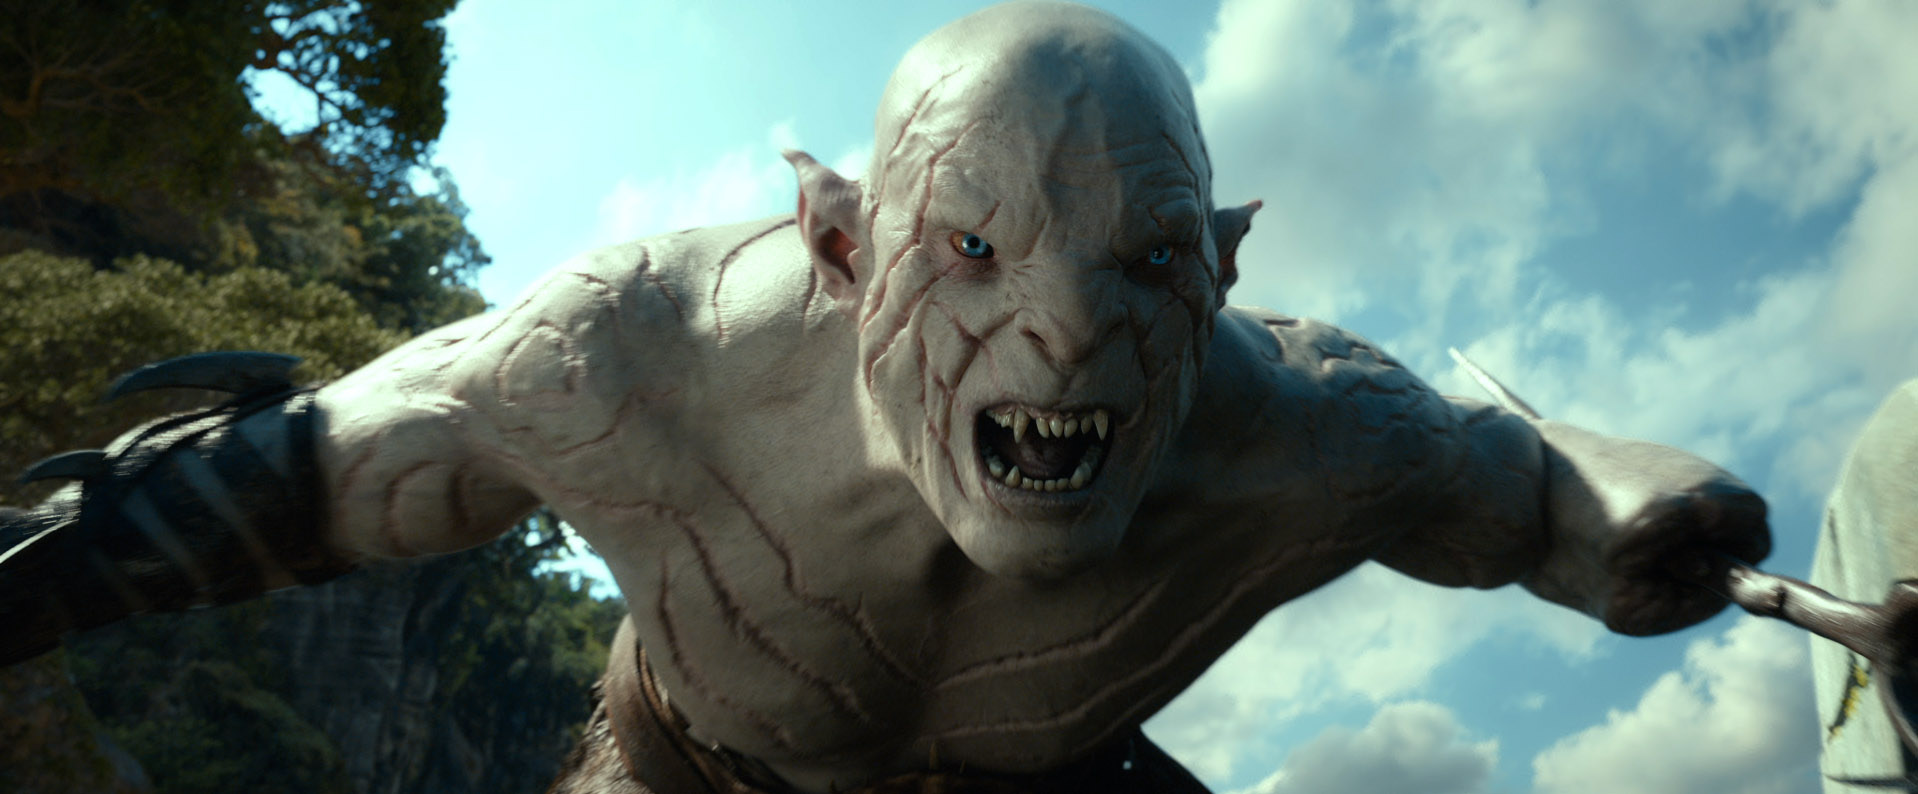 smaug, desolation of smaug, the hobbit, movies, JRR Tolkien, fantasy